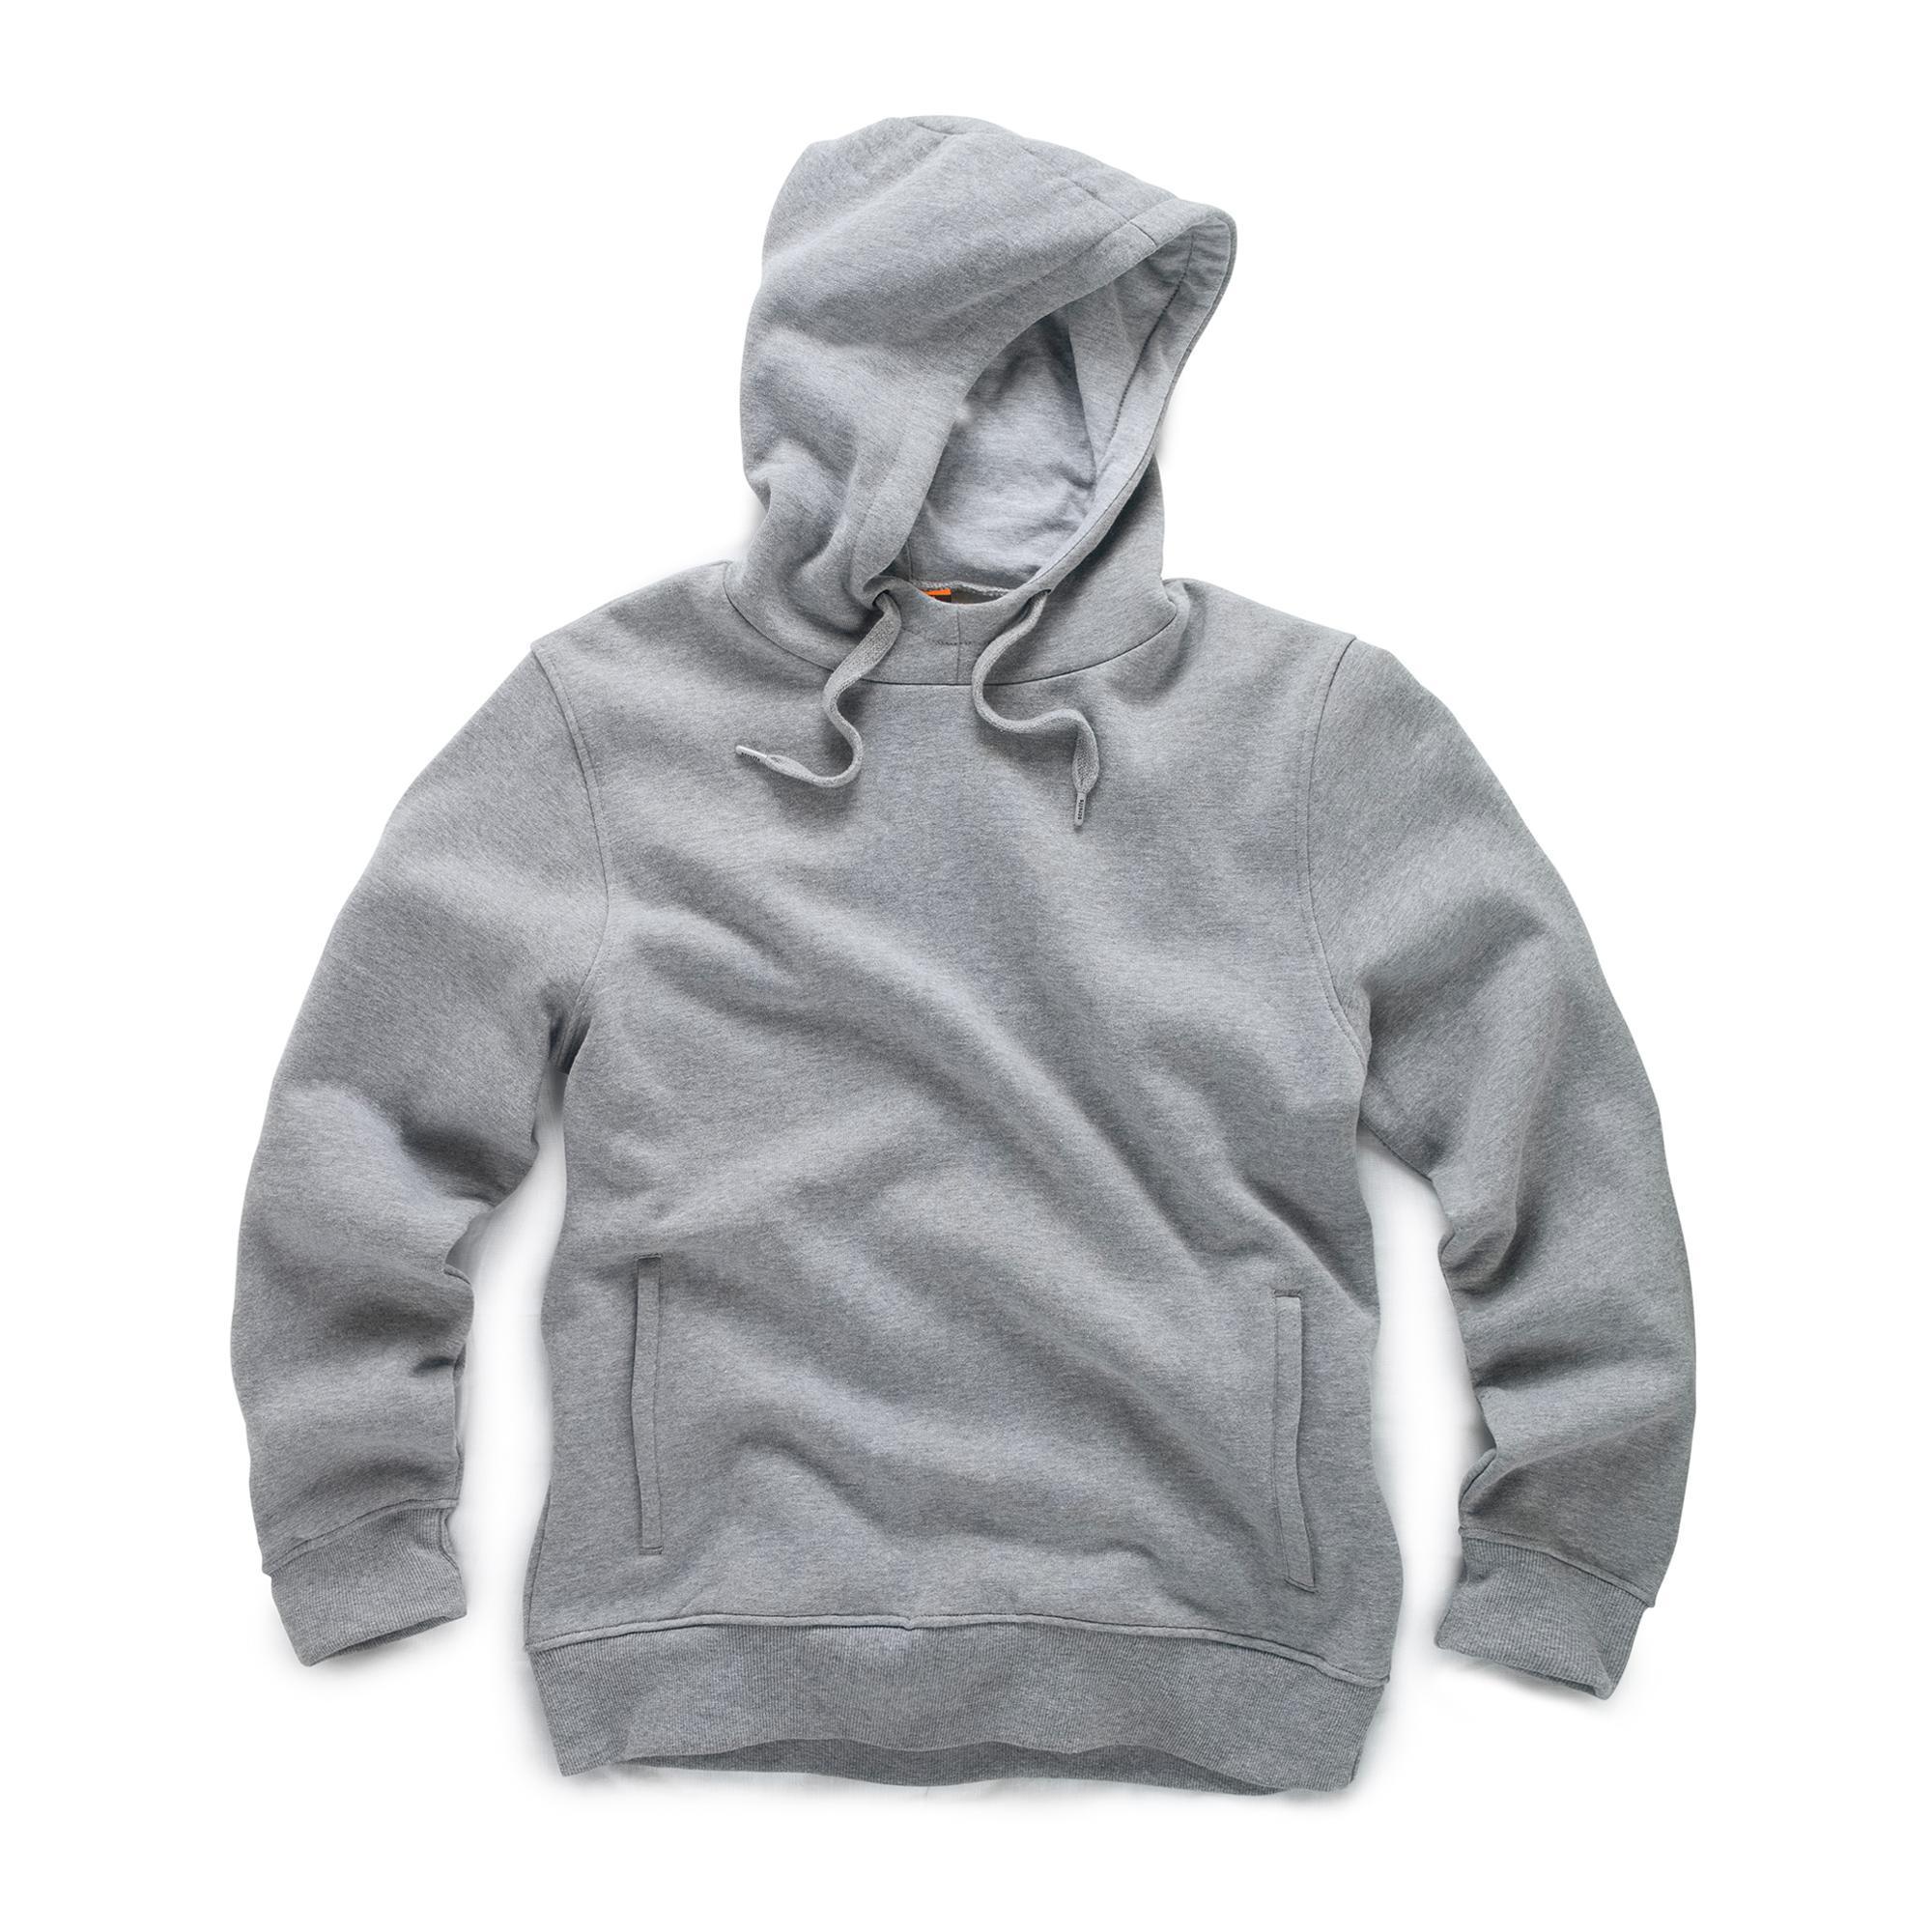 Hoodies & Sweats | Clothing | Topshop